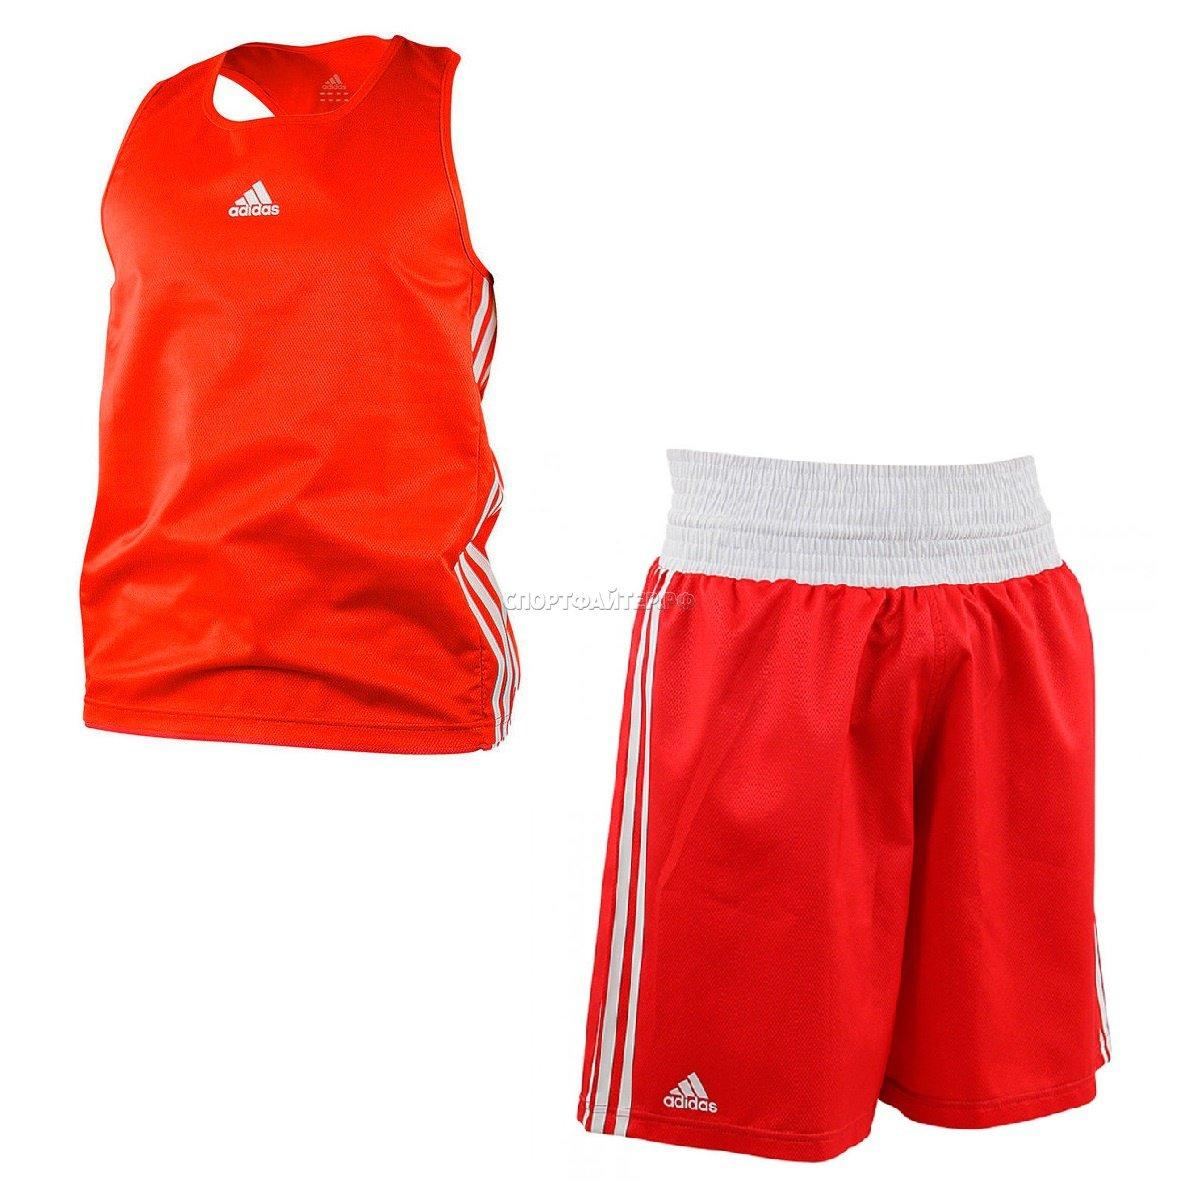 Комплект боксерской формы Adidas micro diamond boxing - красный